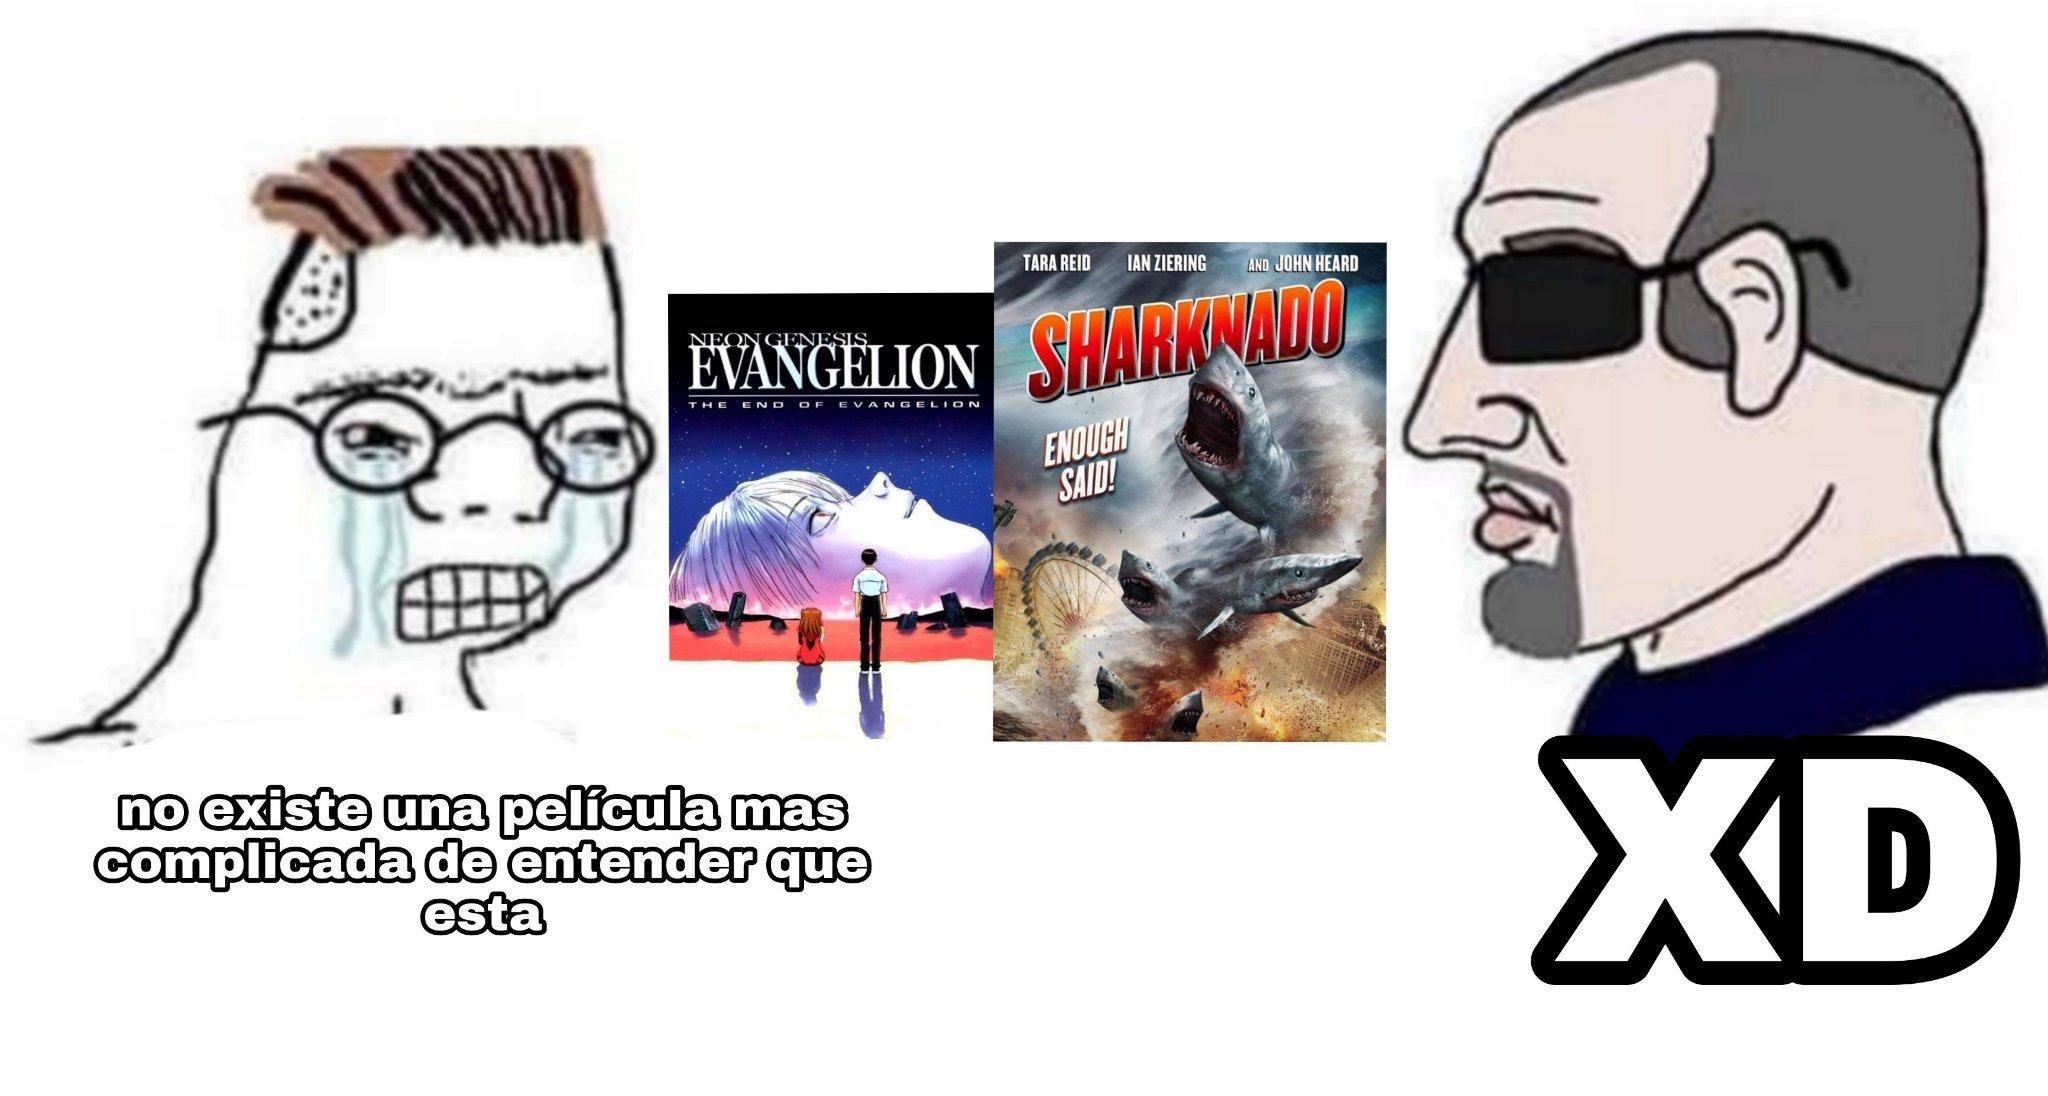 Quien chota entiende sharknado - meme